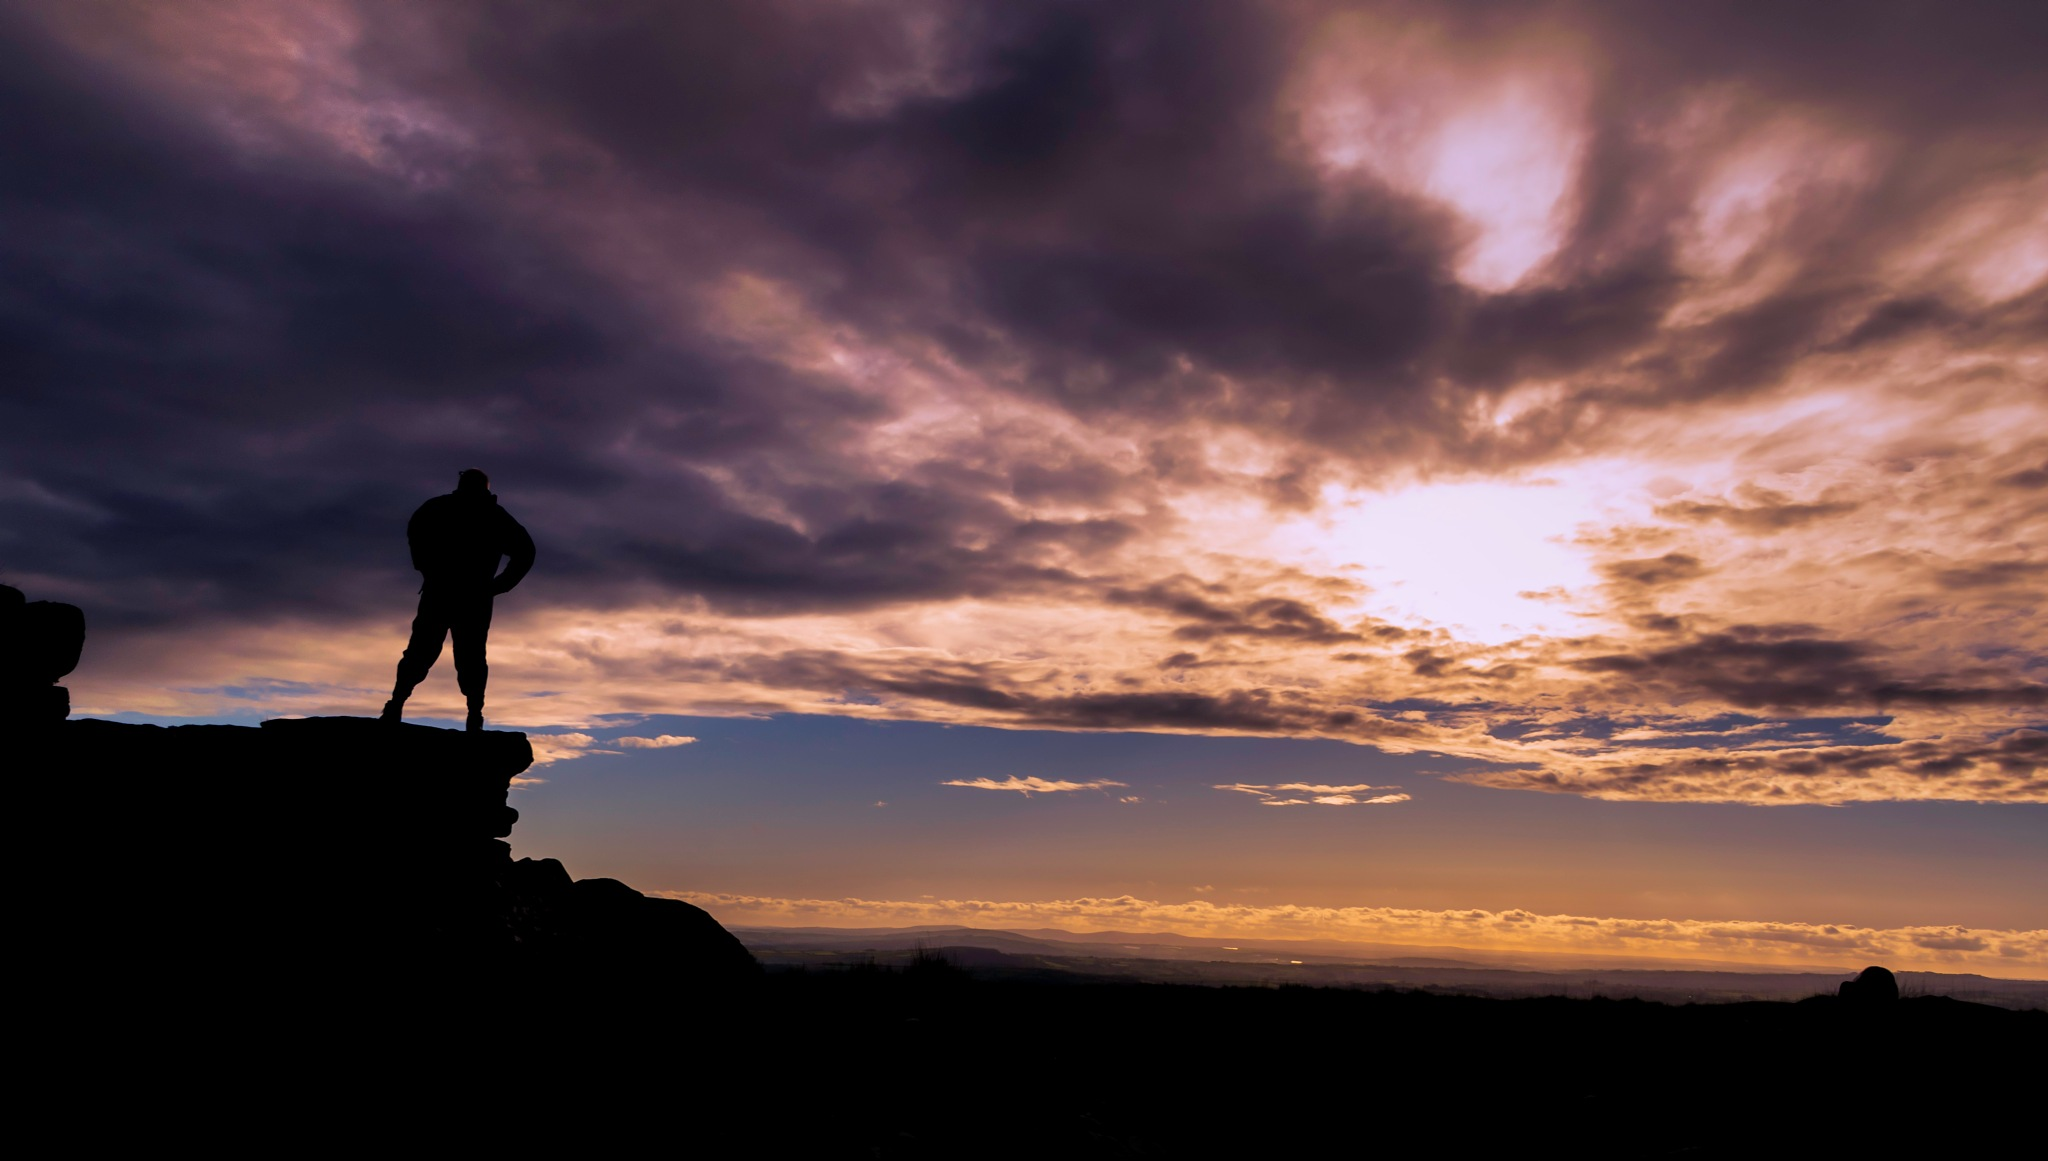 sunset view by phillip ticehurst